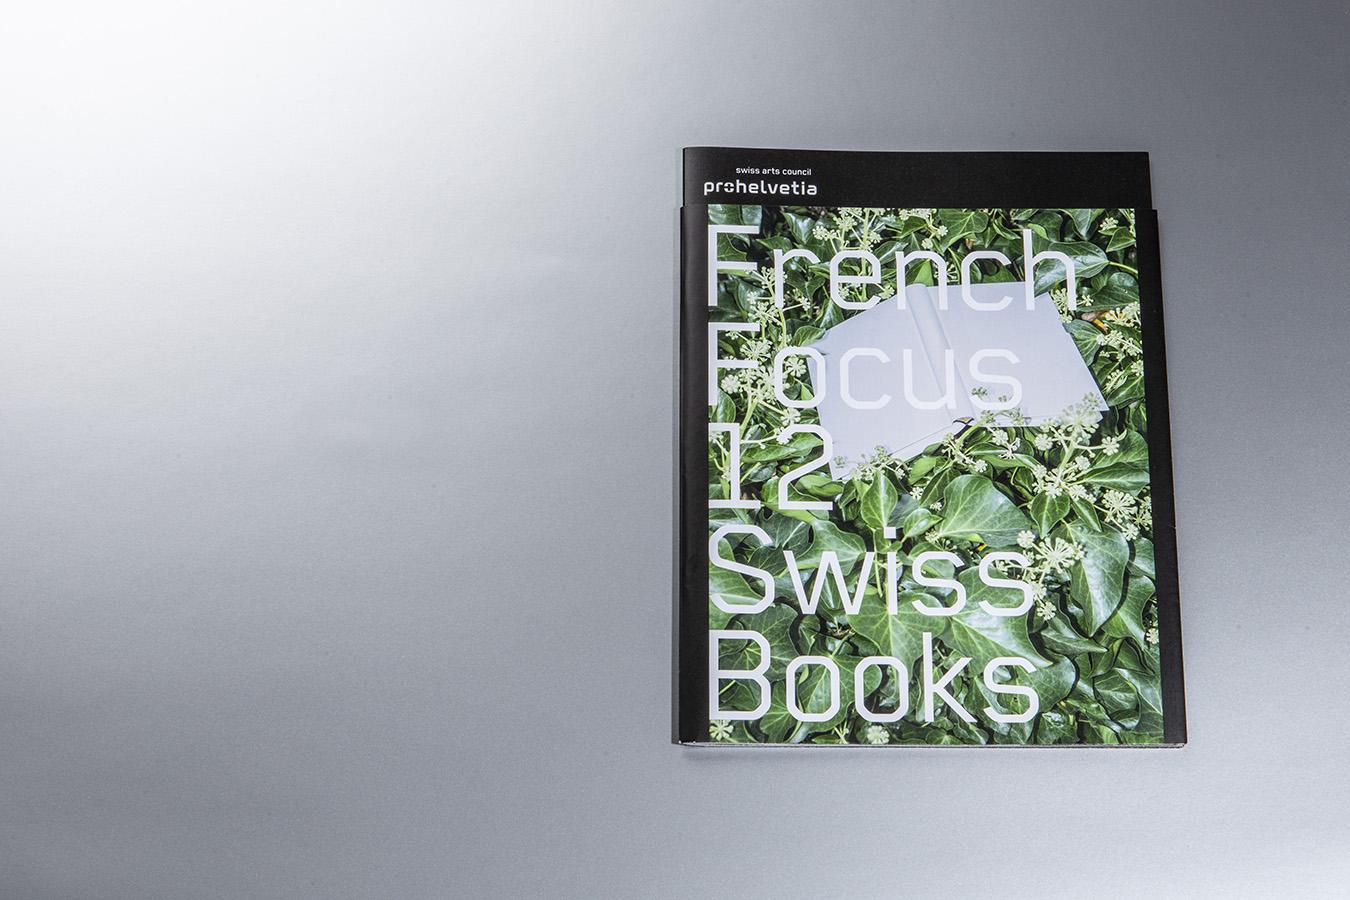 Pro Helvetia 12 Swiss Books Magazin Cover